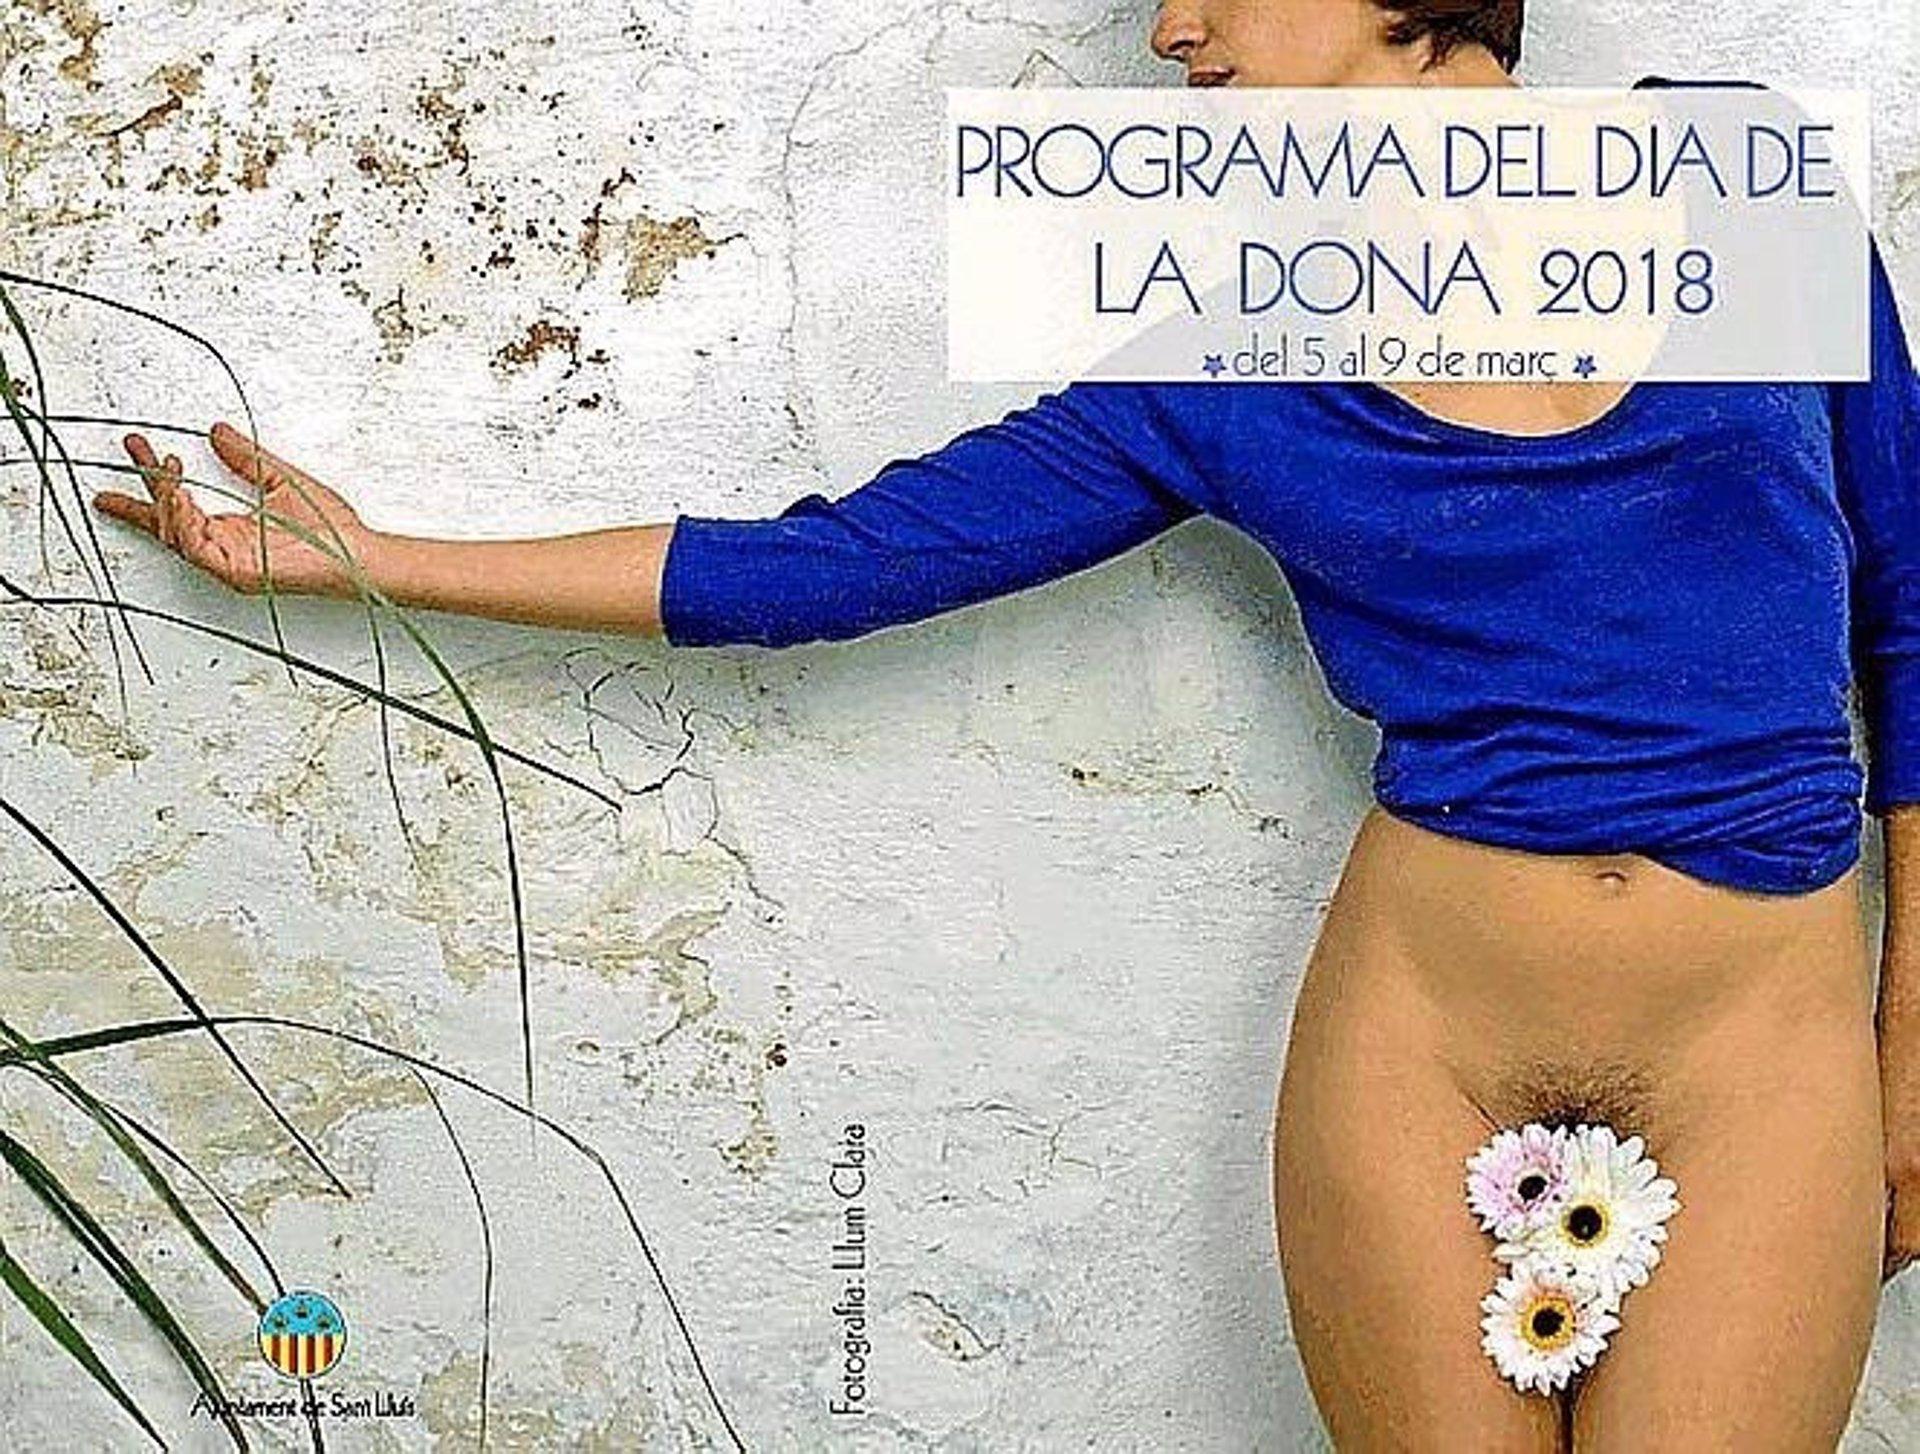 https://img.europapress.es/fotoweb/fotonoticia_20180308130920_1920.jpg